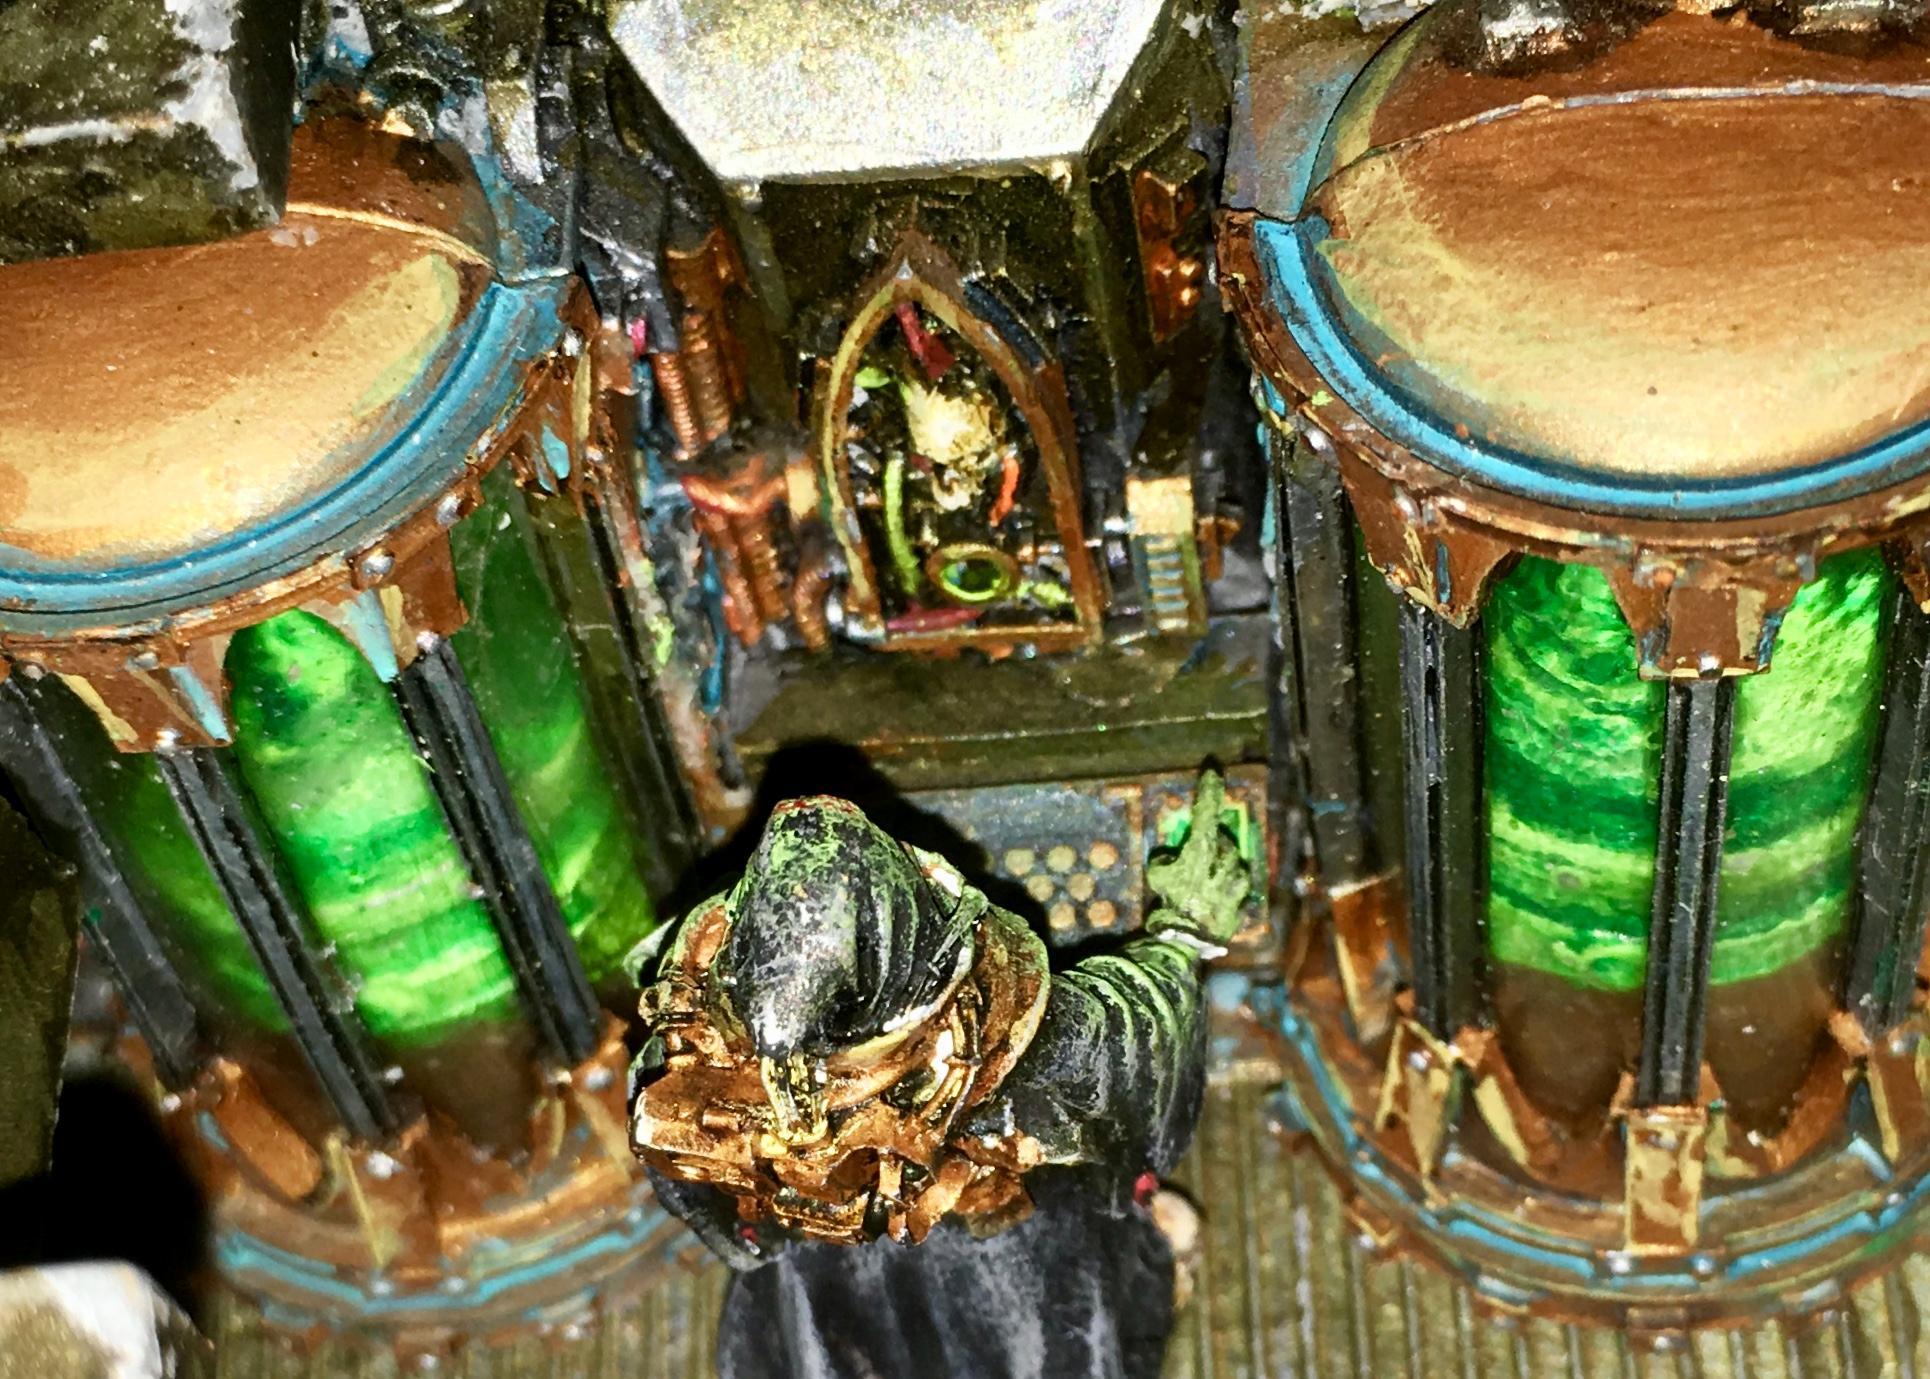 Custom Titan, Death Angels, Forge World, Reaver, Space Marines, Space Marines 40000, Titan, Warhammer 40,000